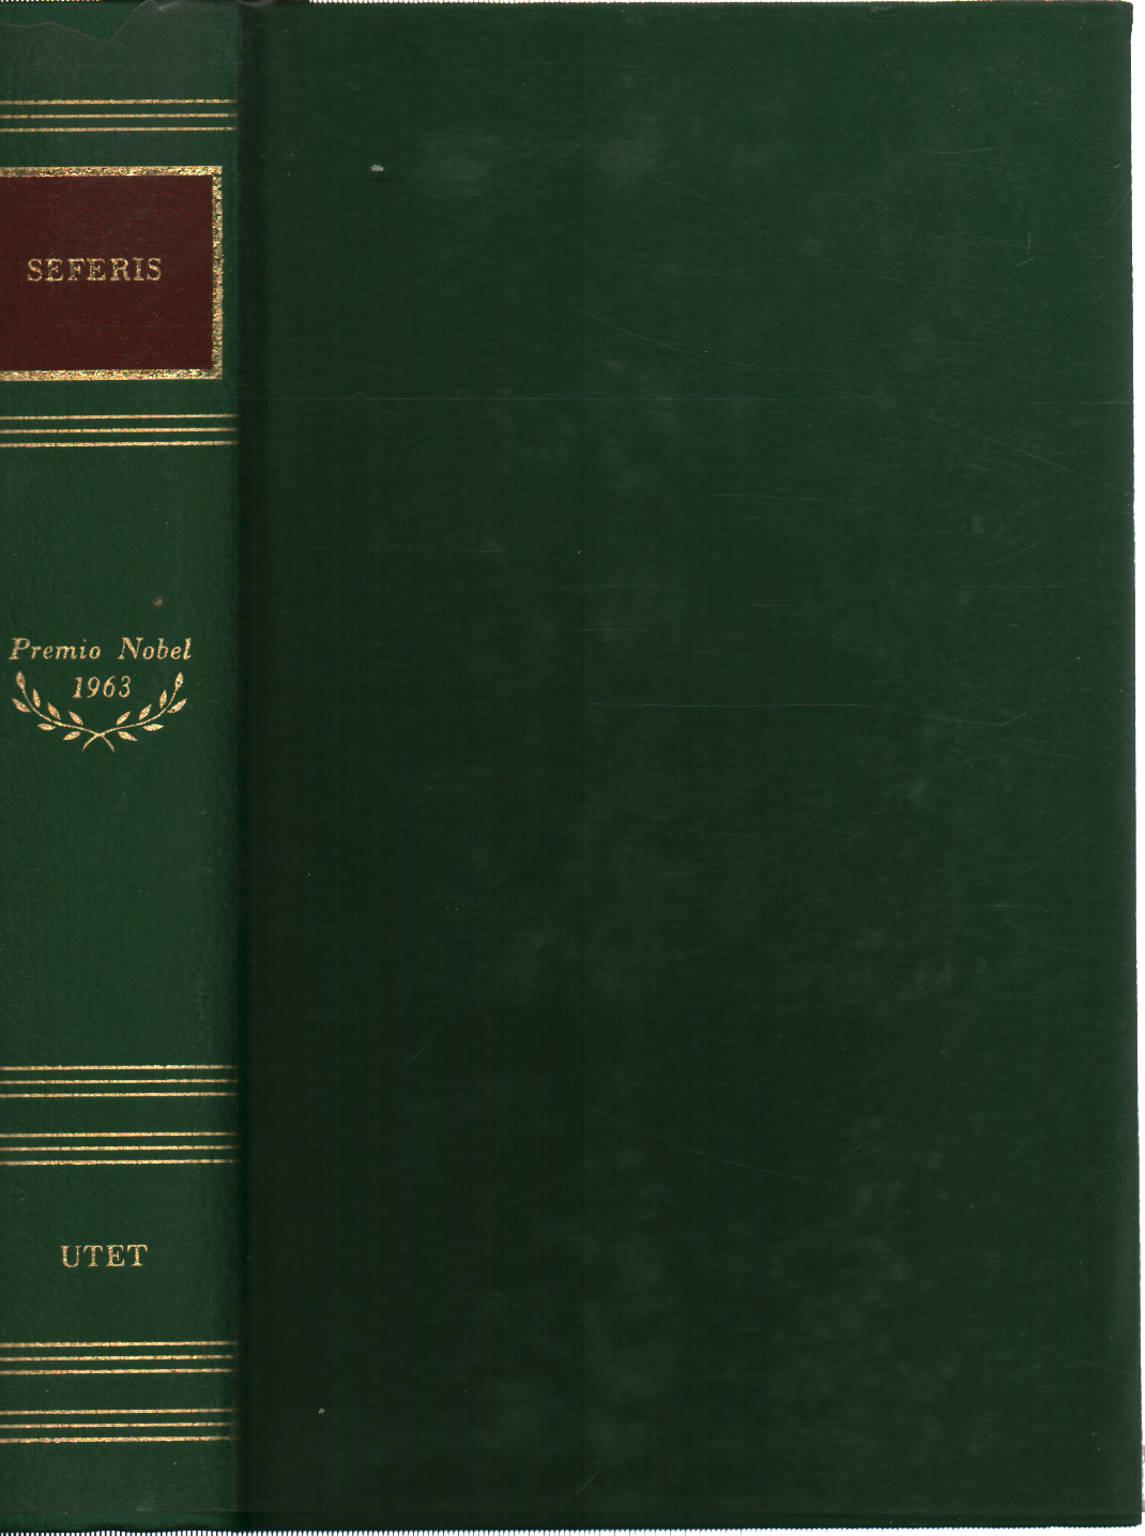 Les Travaux De George Seferis Giorgio Seferis Poesia